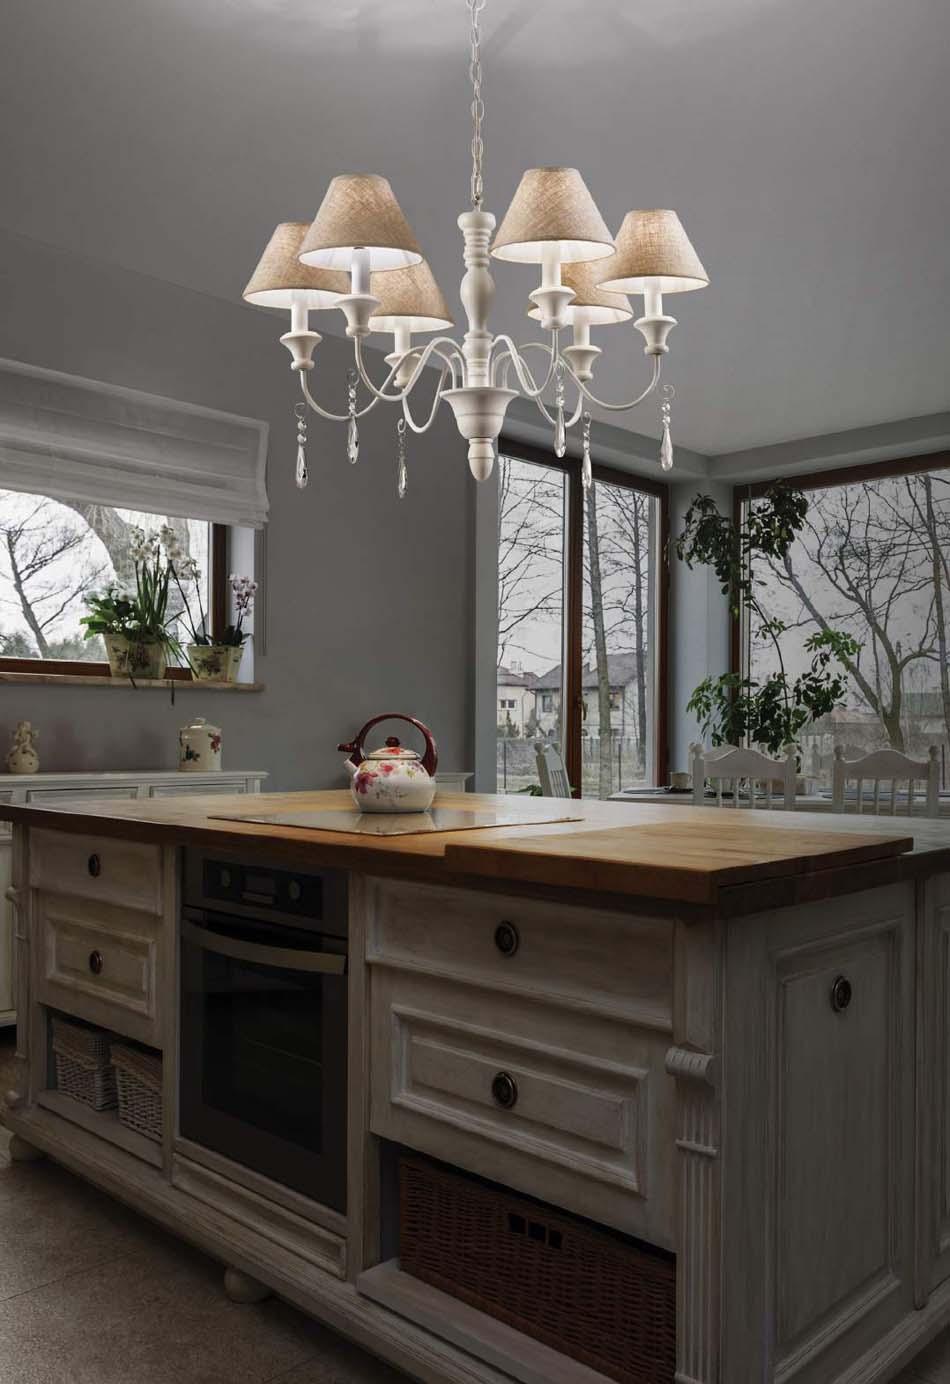 Lampade 58 sospese vintage Ideal Lux Provence – Toscana Arredamenti